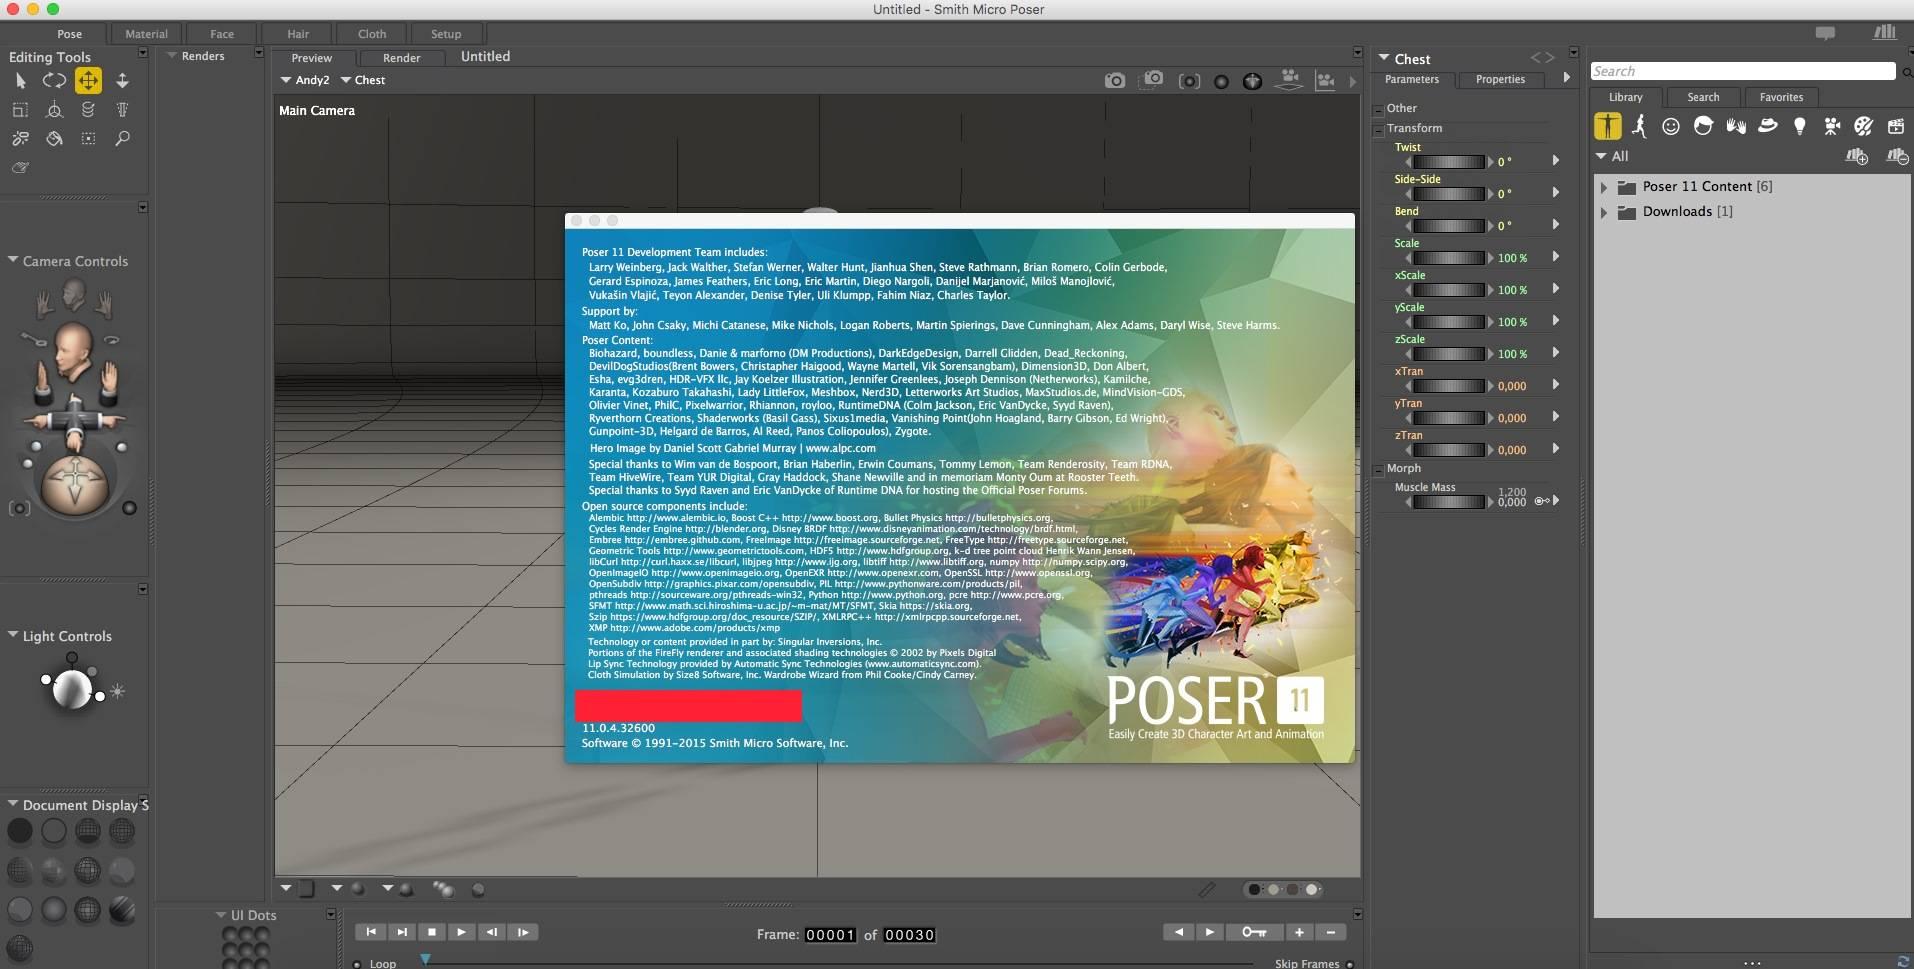 Poser Software